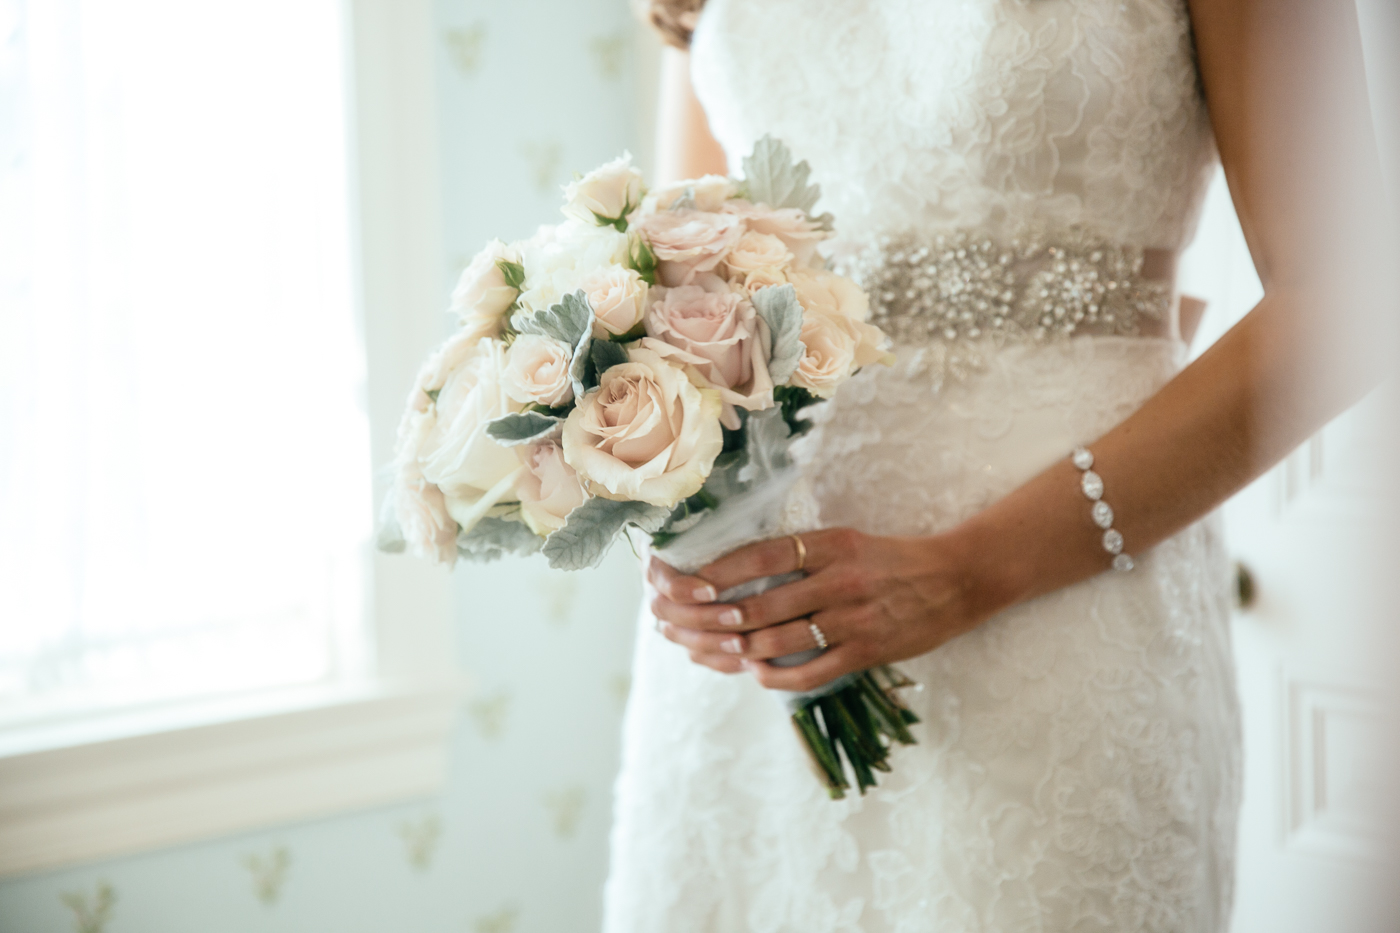 RYAN_&_KELLEY_DARLINGTON_HOUSE_WEDDING_2014_7X9A1732.JPG